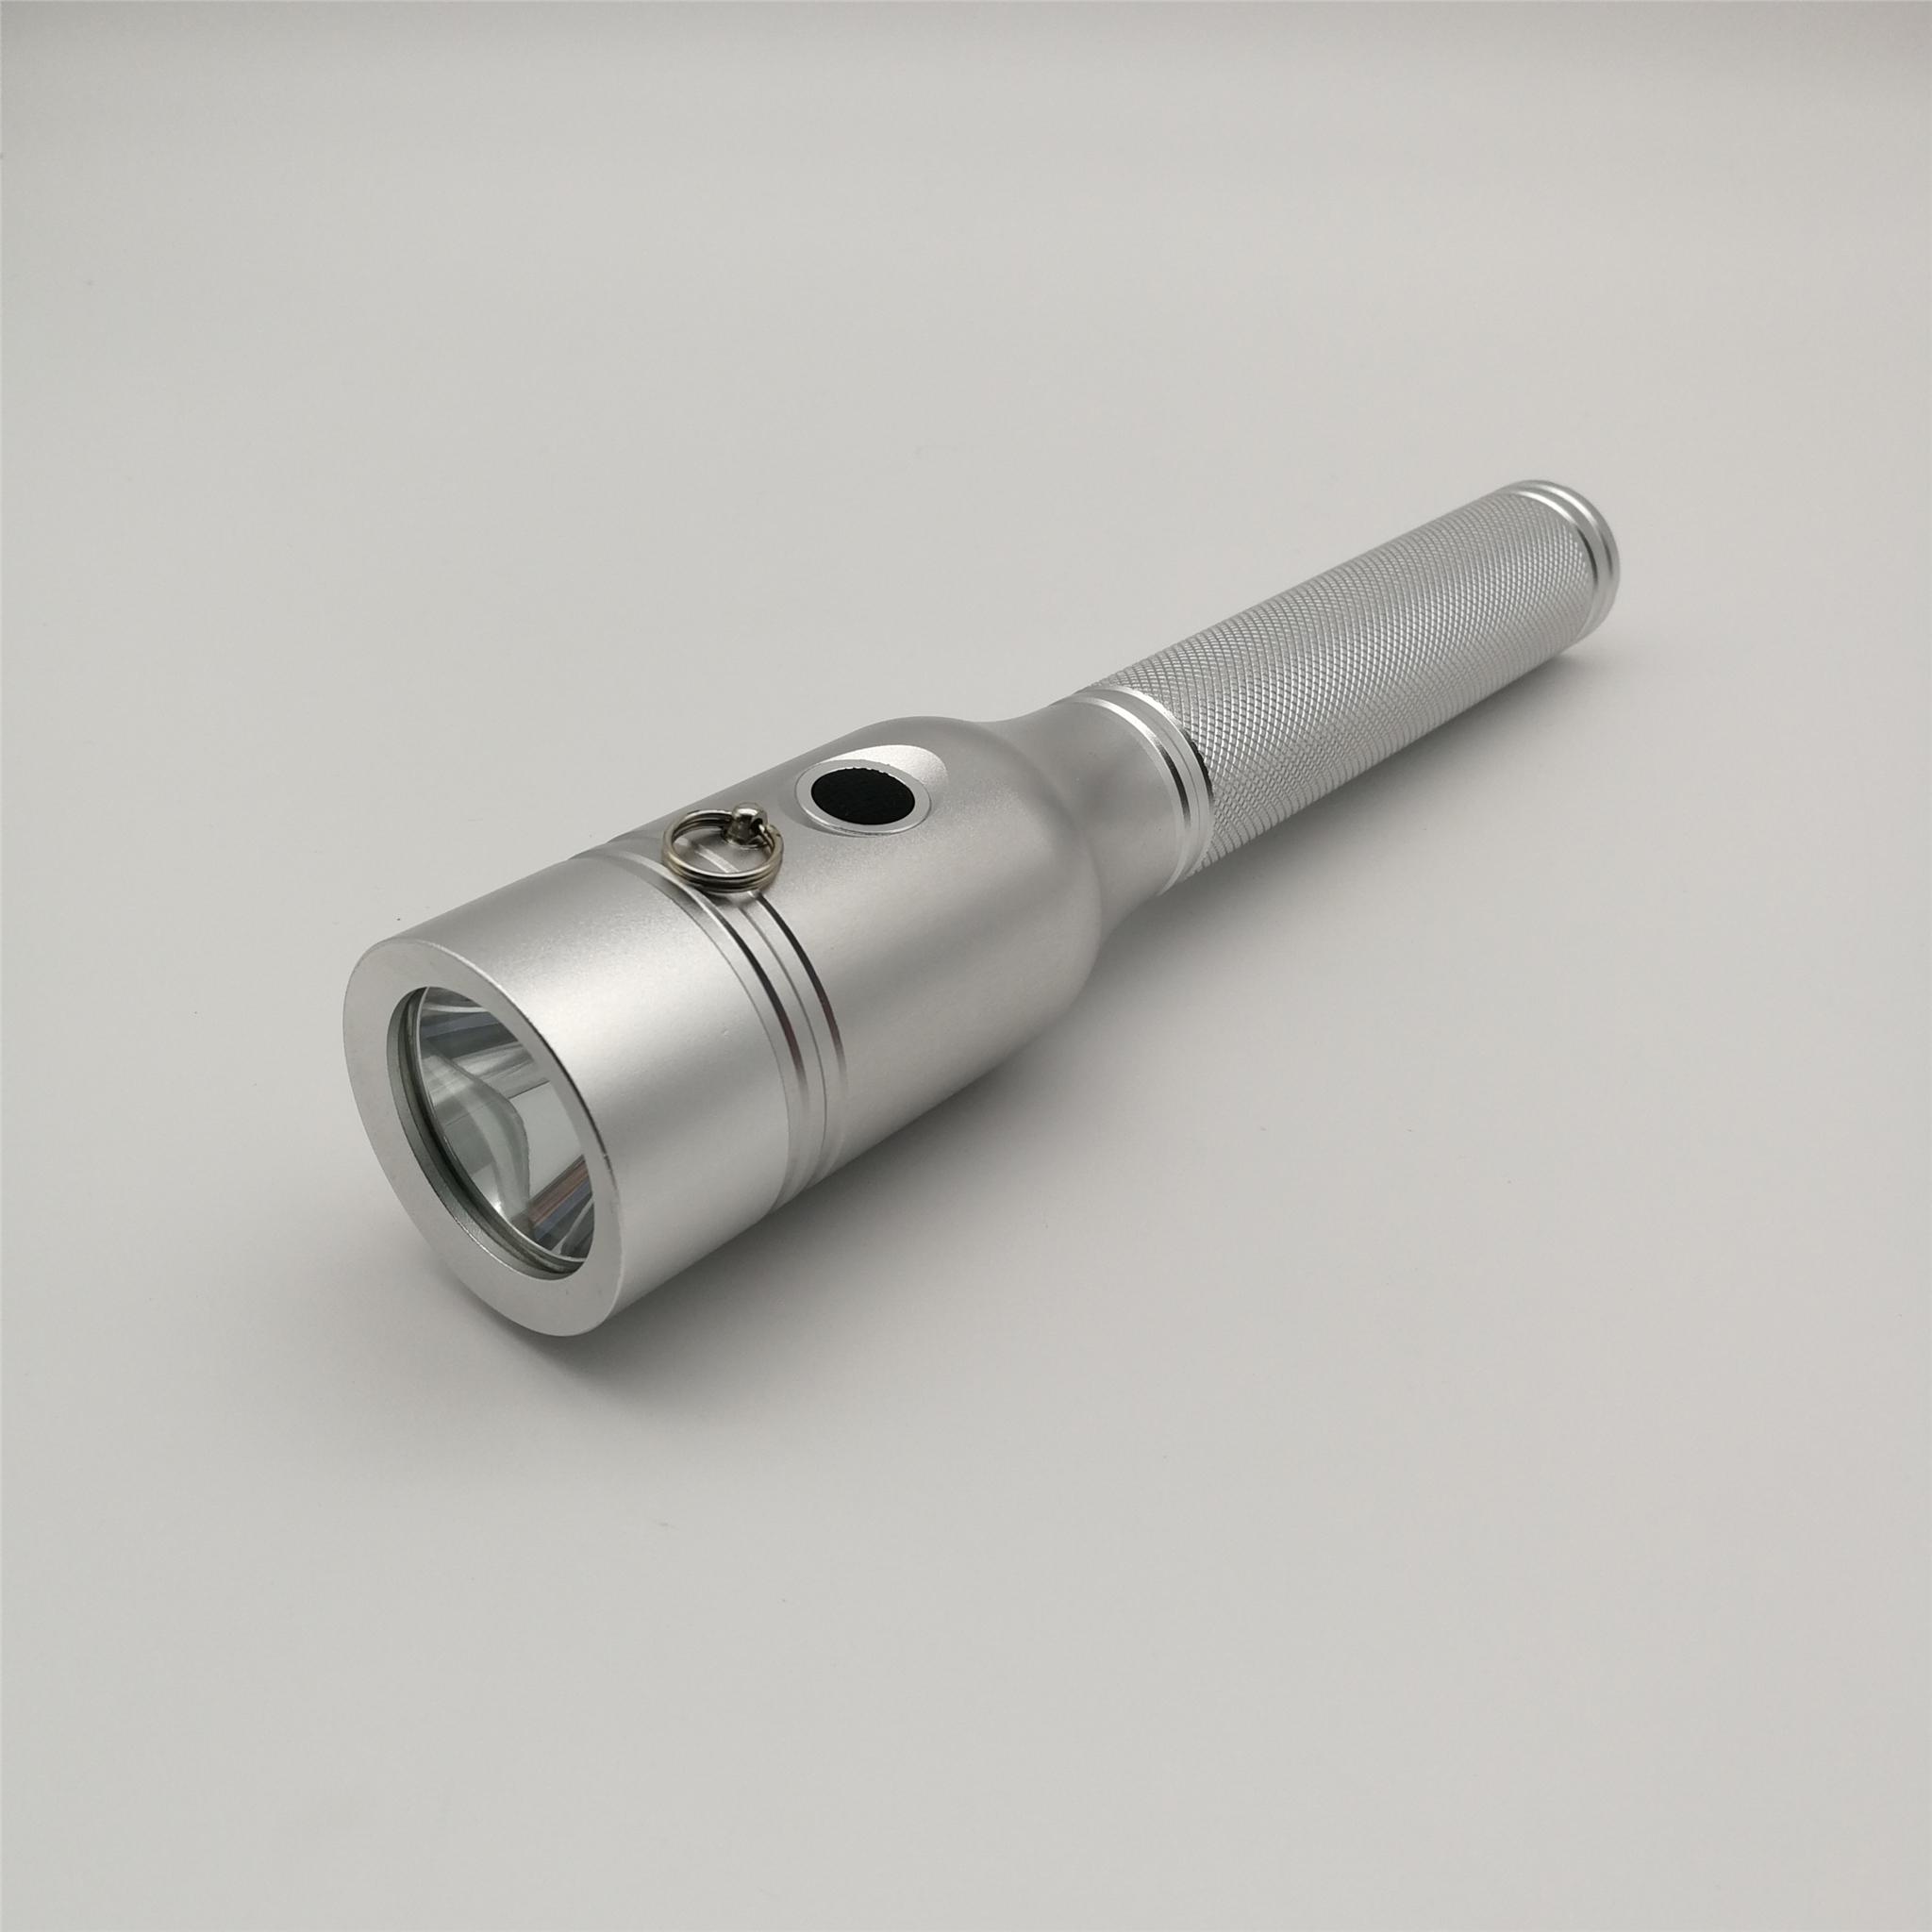 JW7622防爆LED手电筒JW7622防爆防水筒